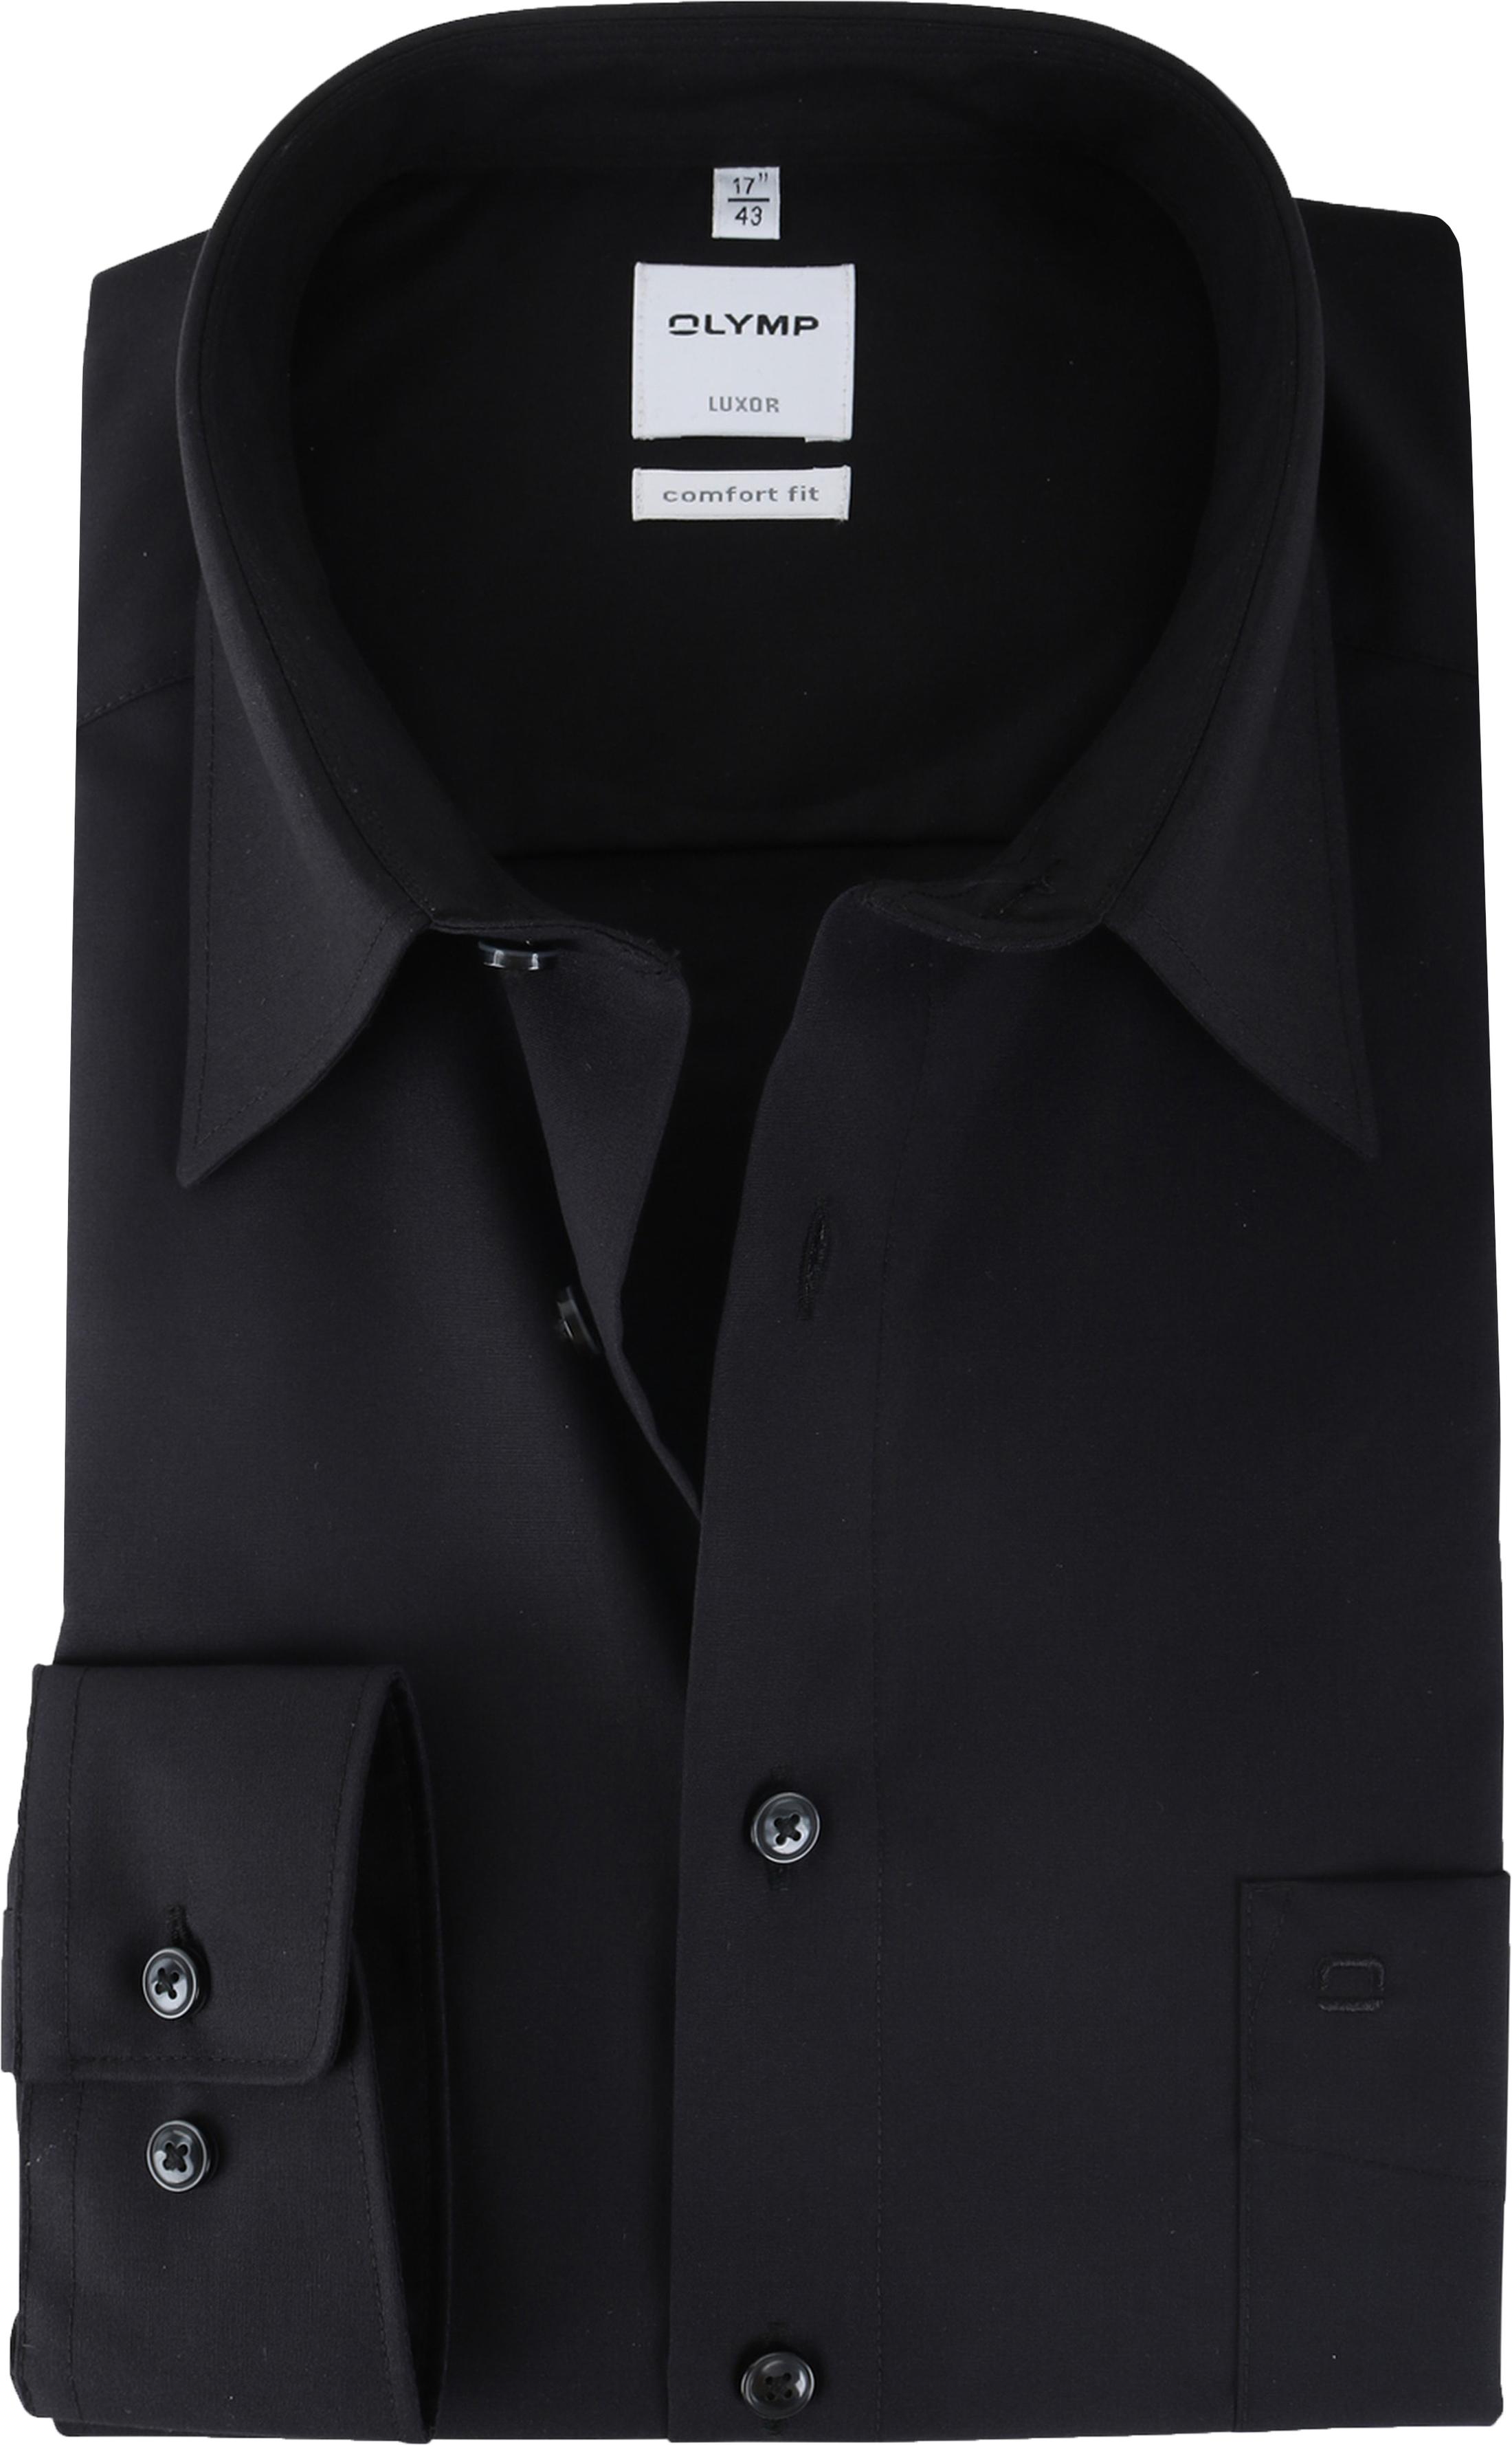 OLYMP Luxor Shirt Zwart Comfort Fit foto 0